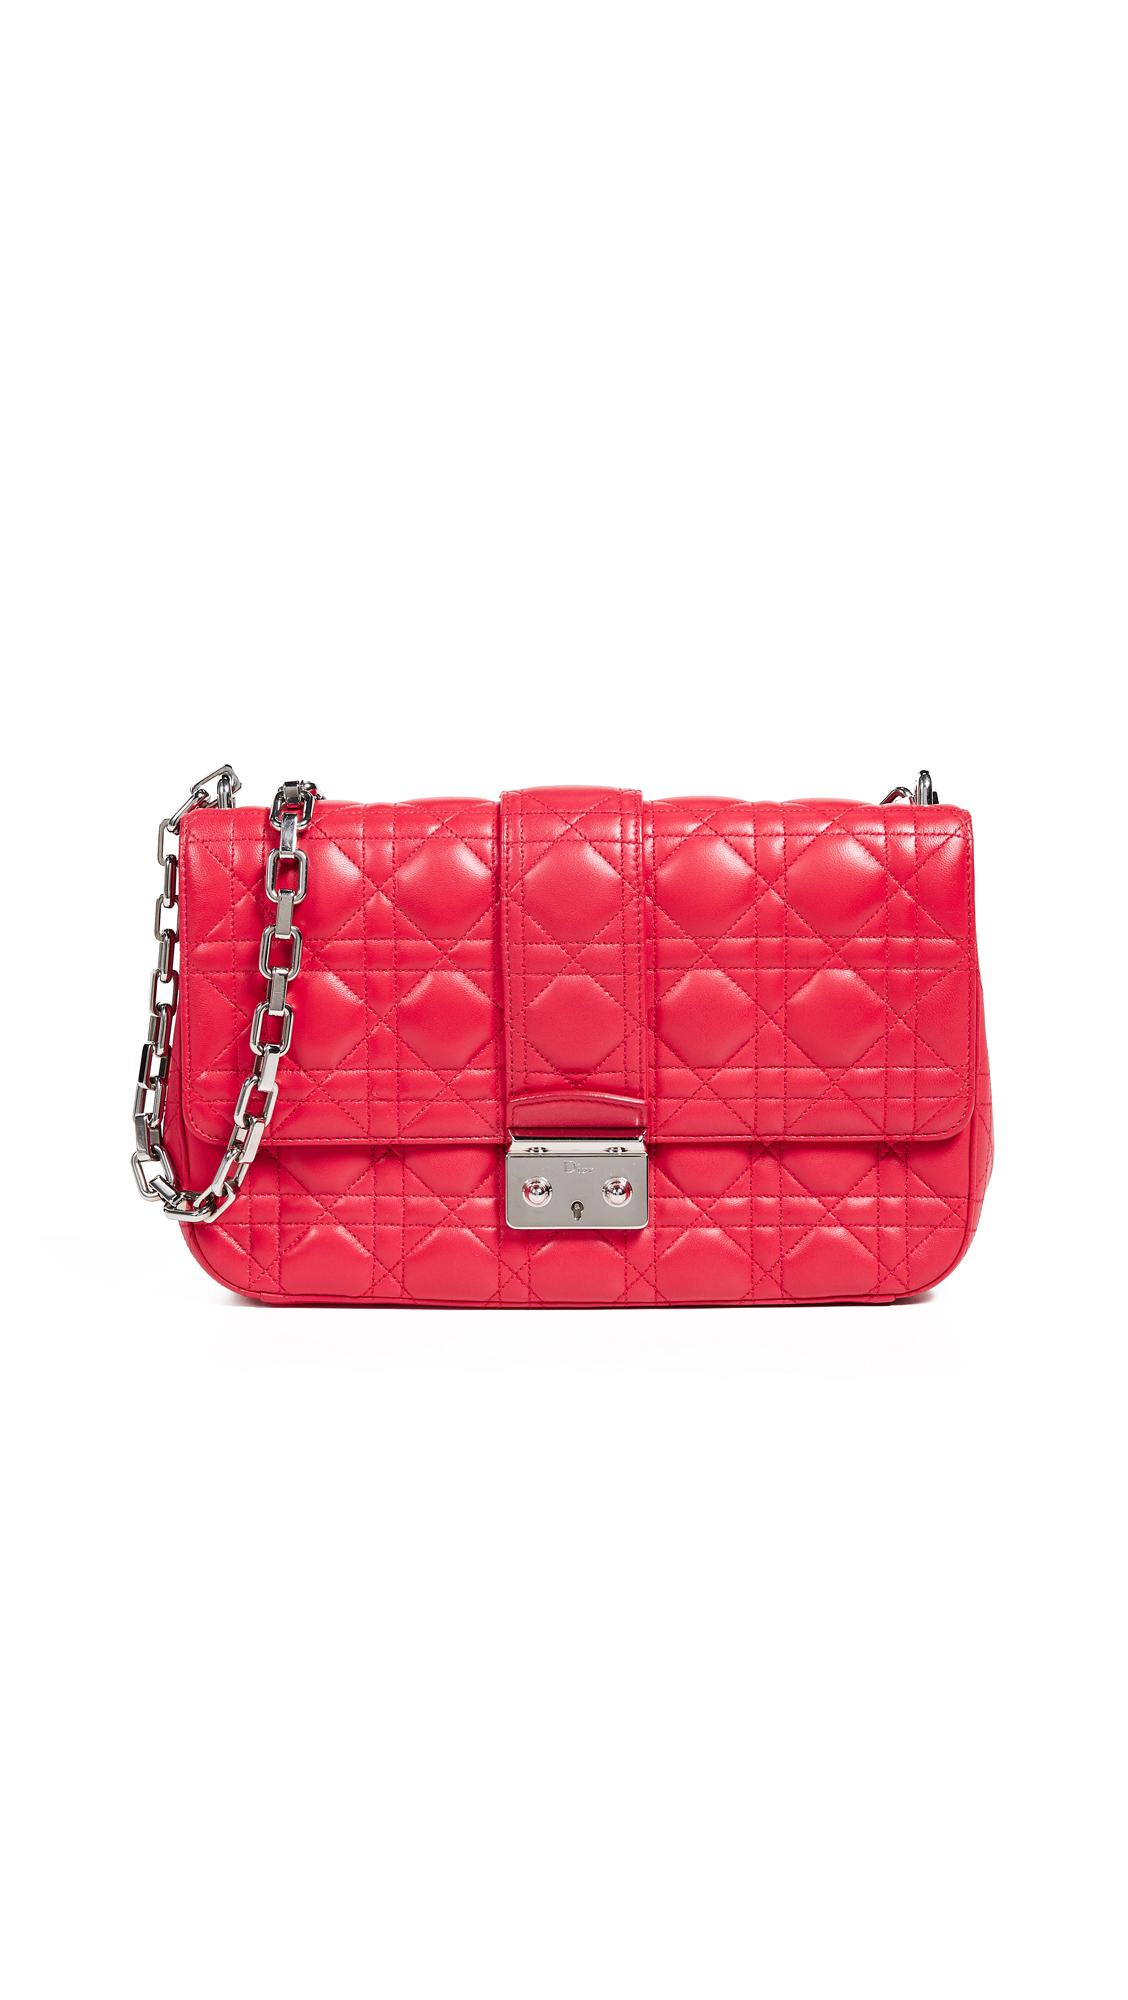 What Goes Around Comes Around Dior Pink Lambskin Miss Dior Medium Bag In Pink